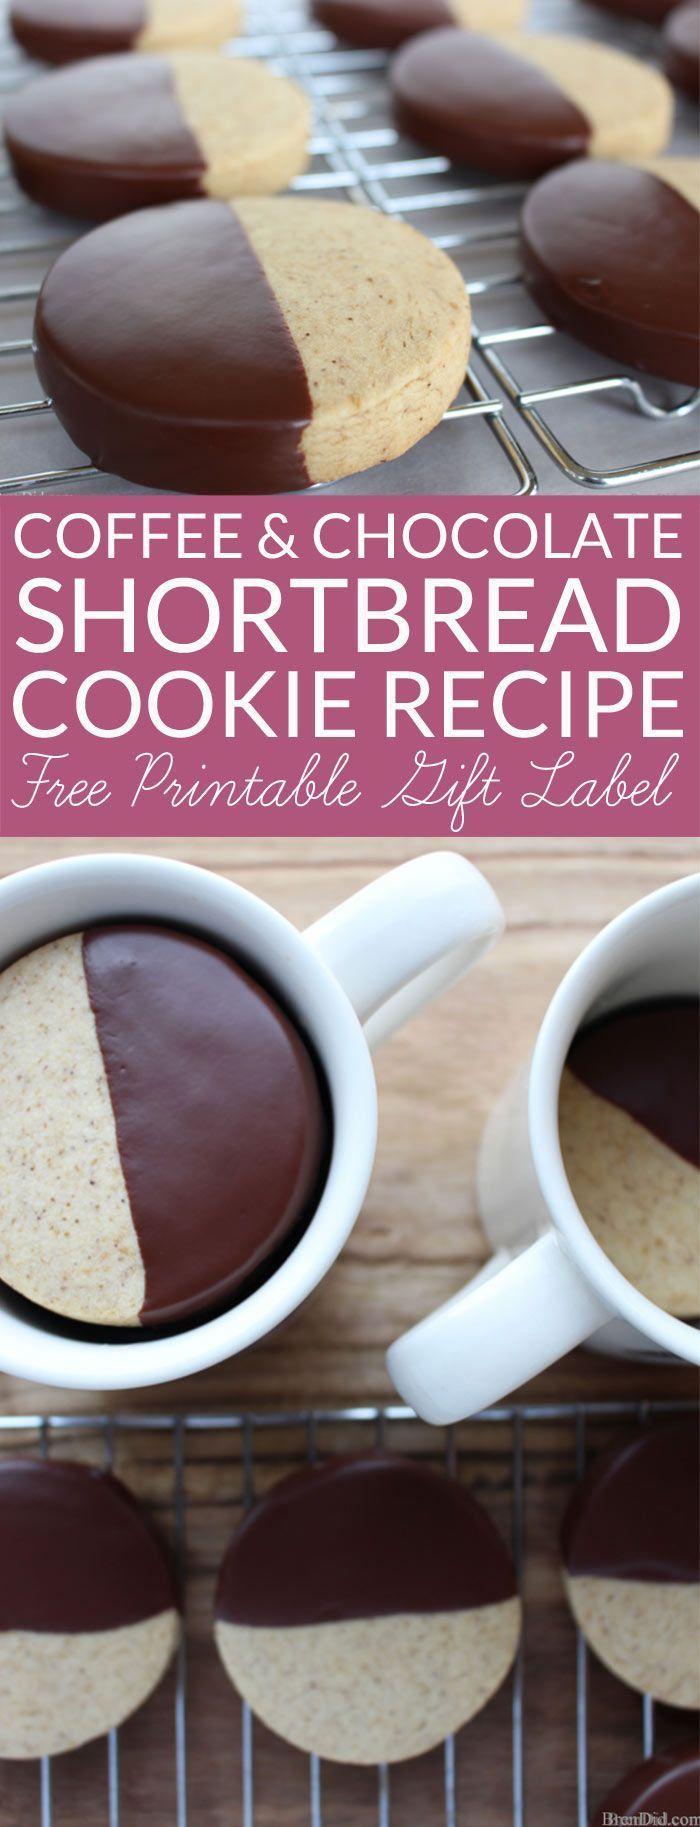 Coffee and Chocolate Shortbread Recipe